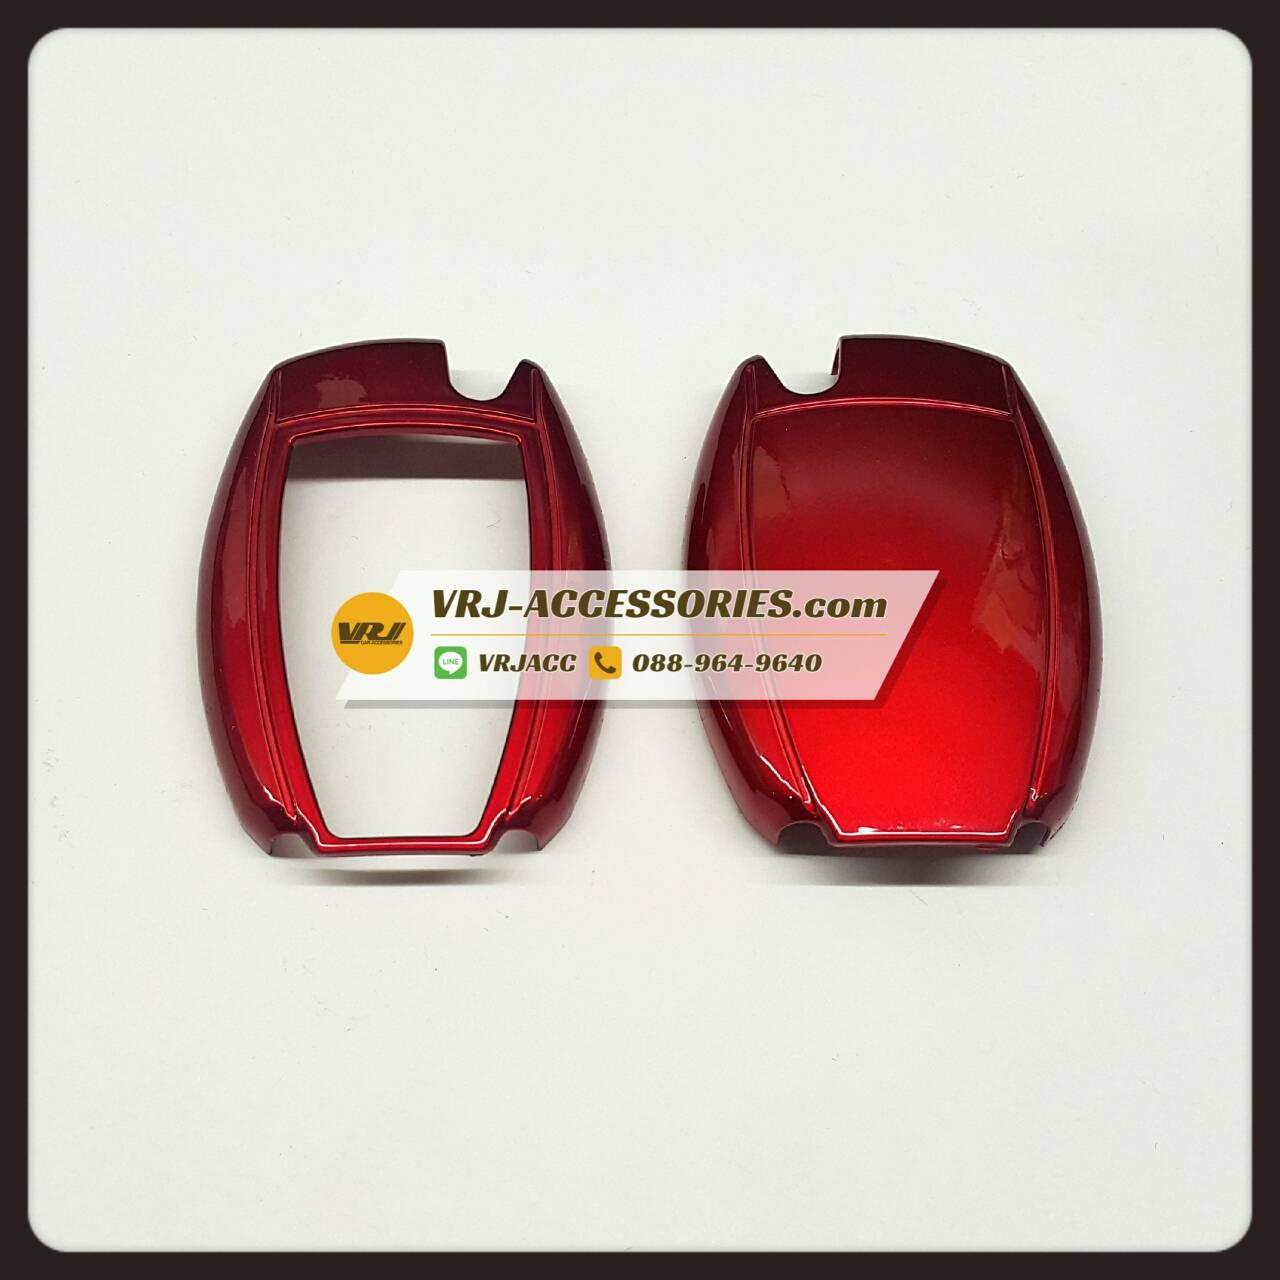 VJ2745 กรอบใส่รีโมทรถยนต์ CASE แข็งหุ้มรีโมท เบนซ์ : Hard case cover for cars - Mercedes Benz